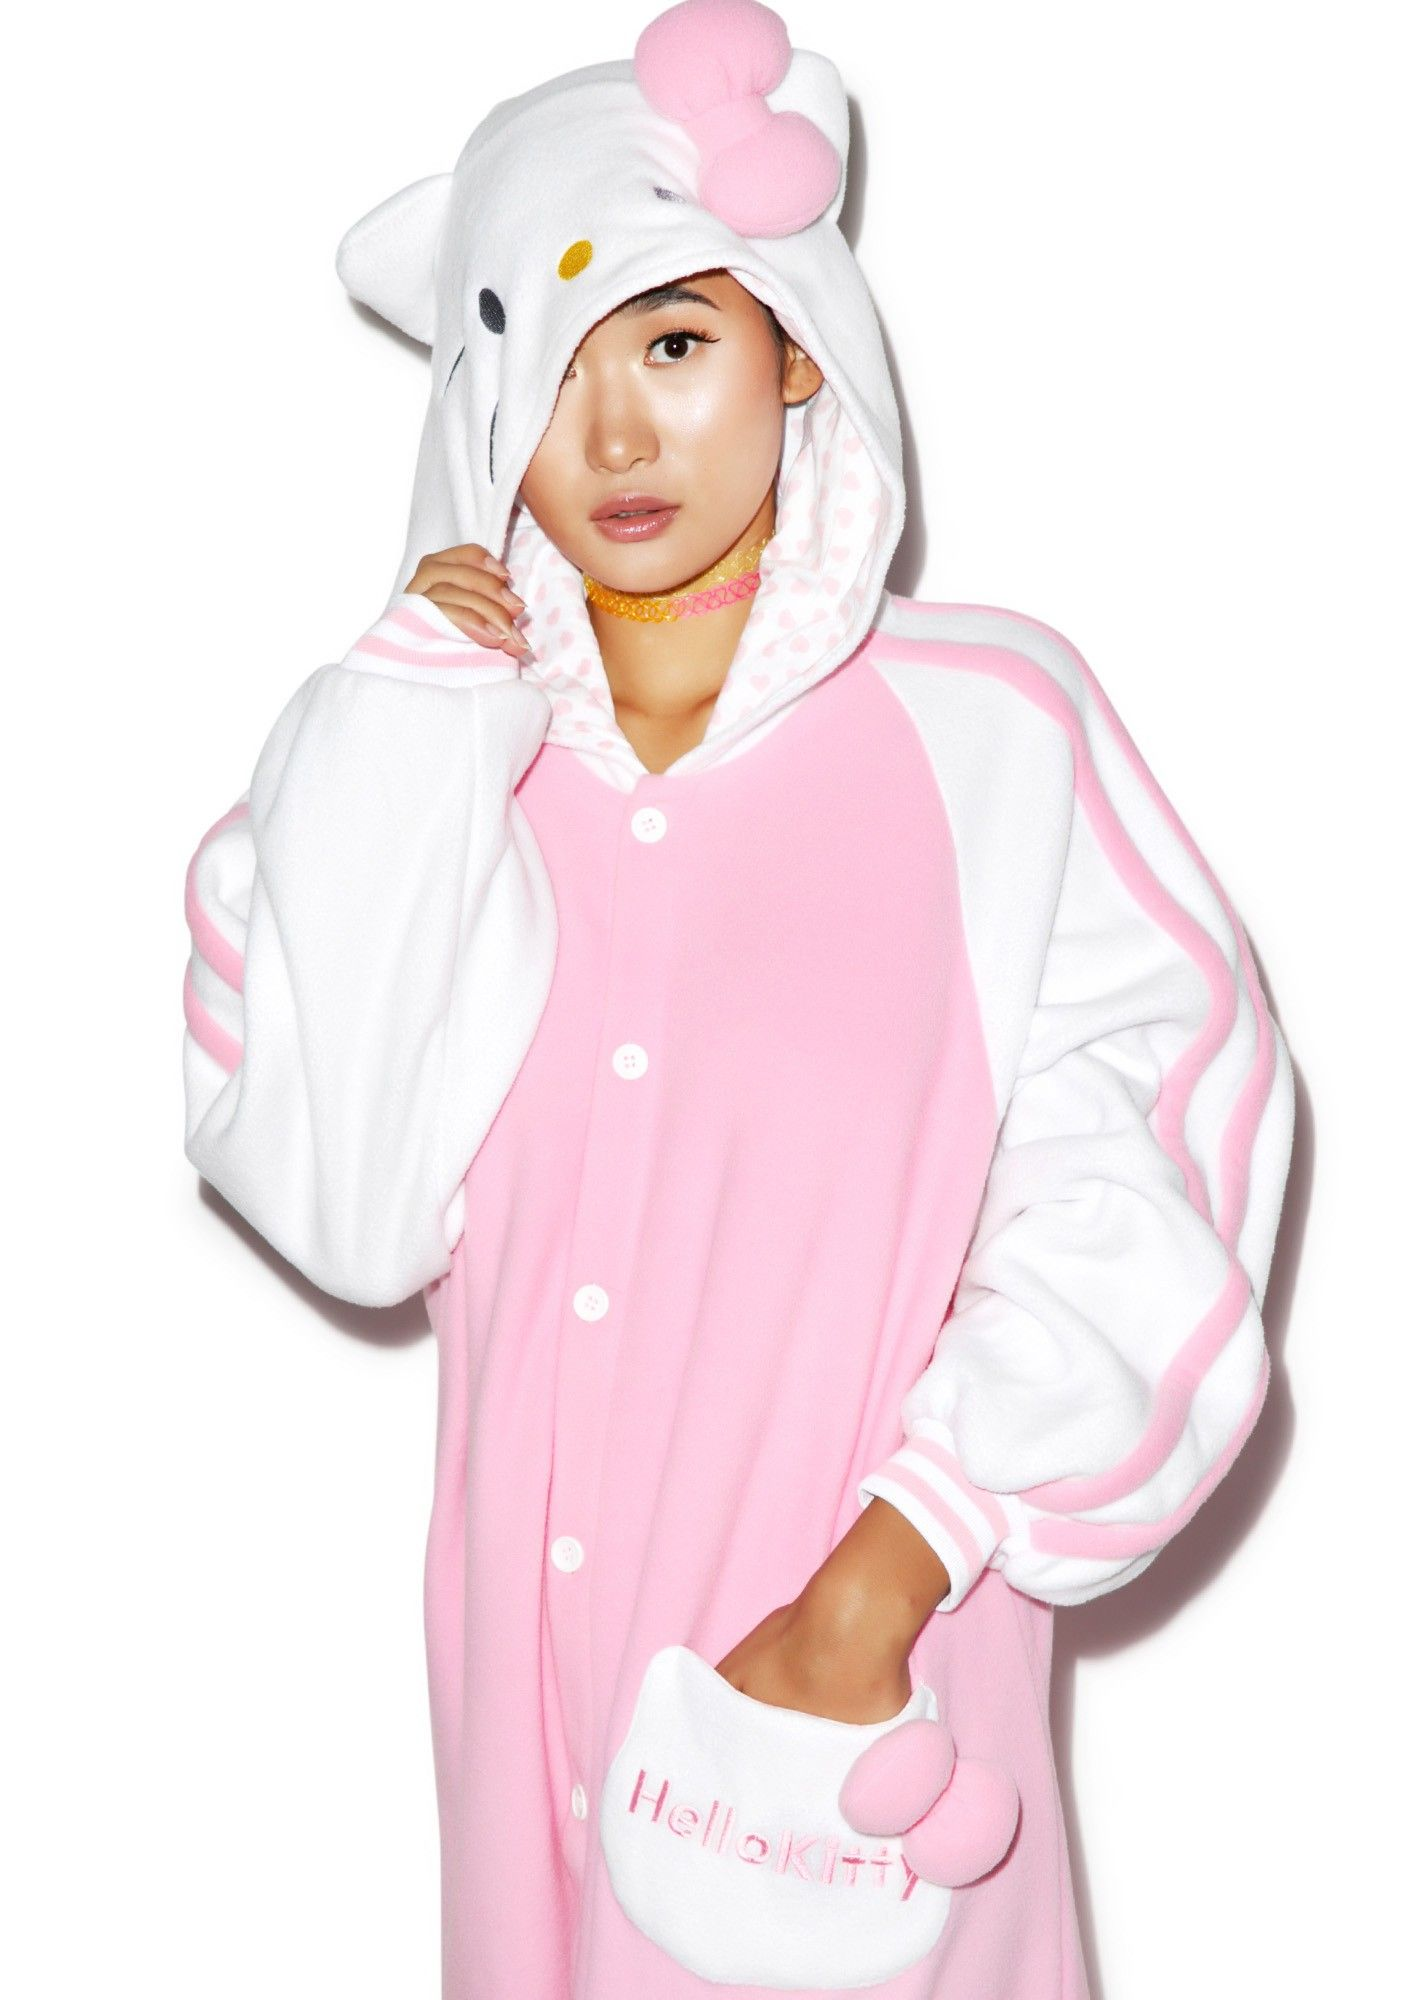 d573a562b5 Sazac Hello Kitty Kigurumi